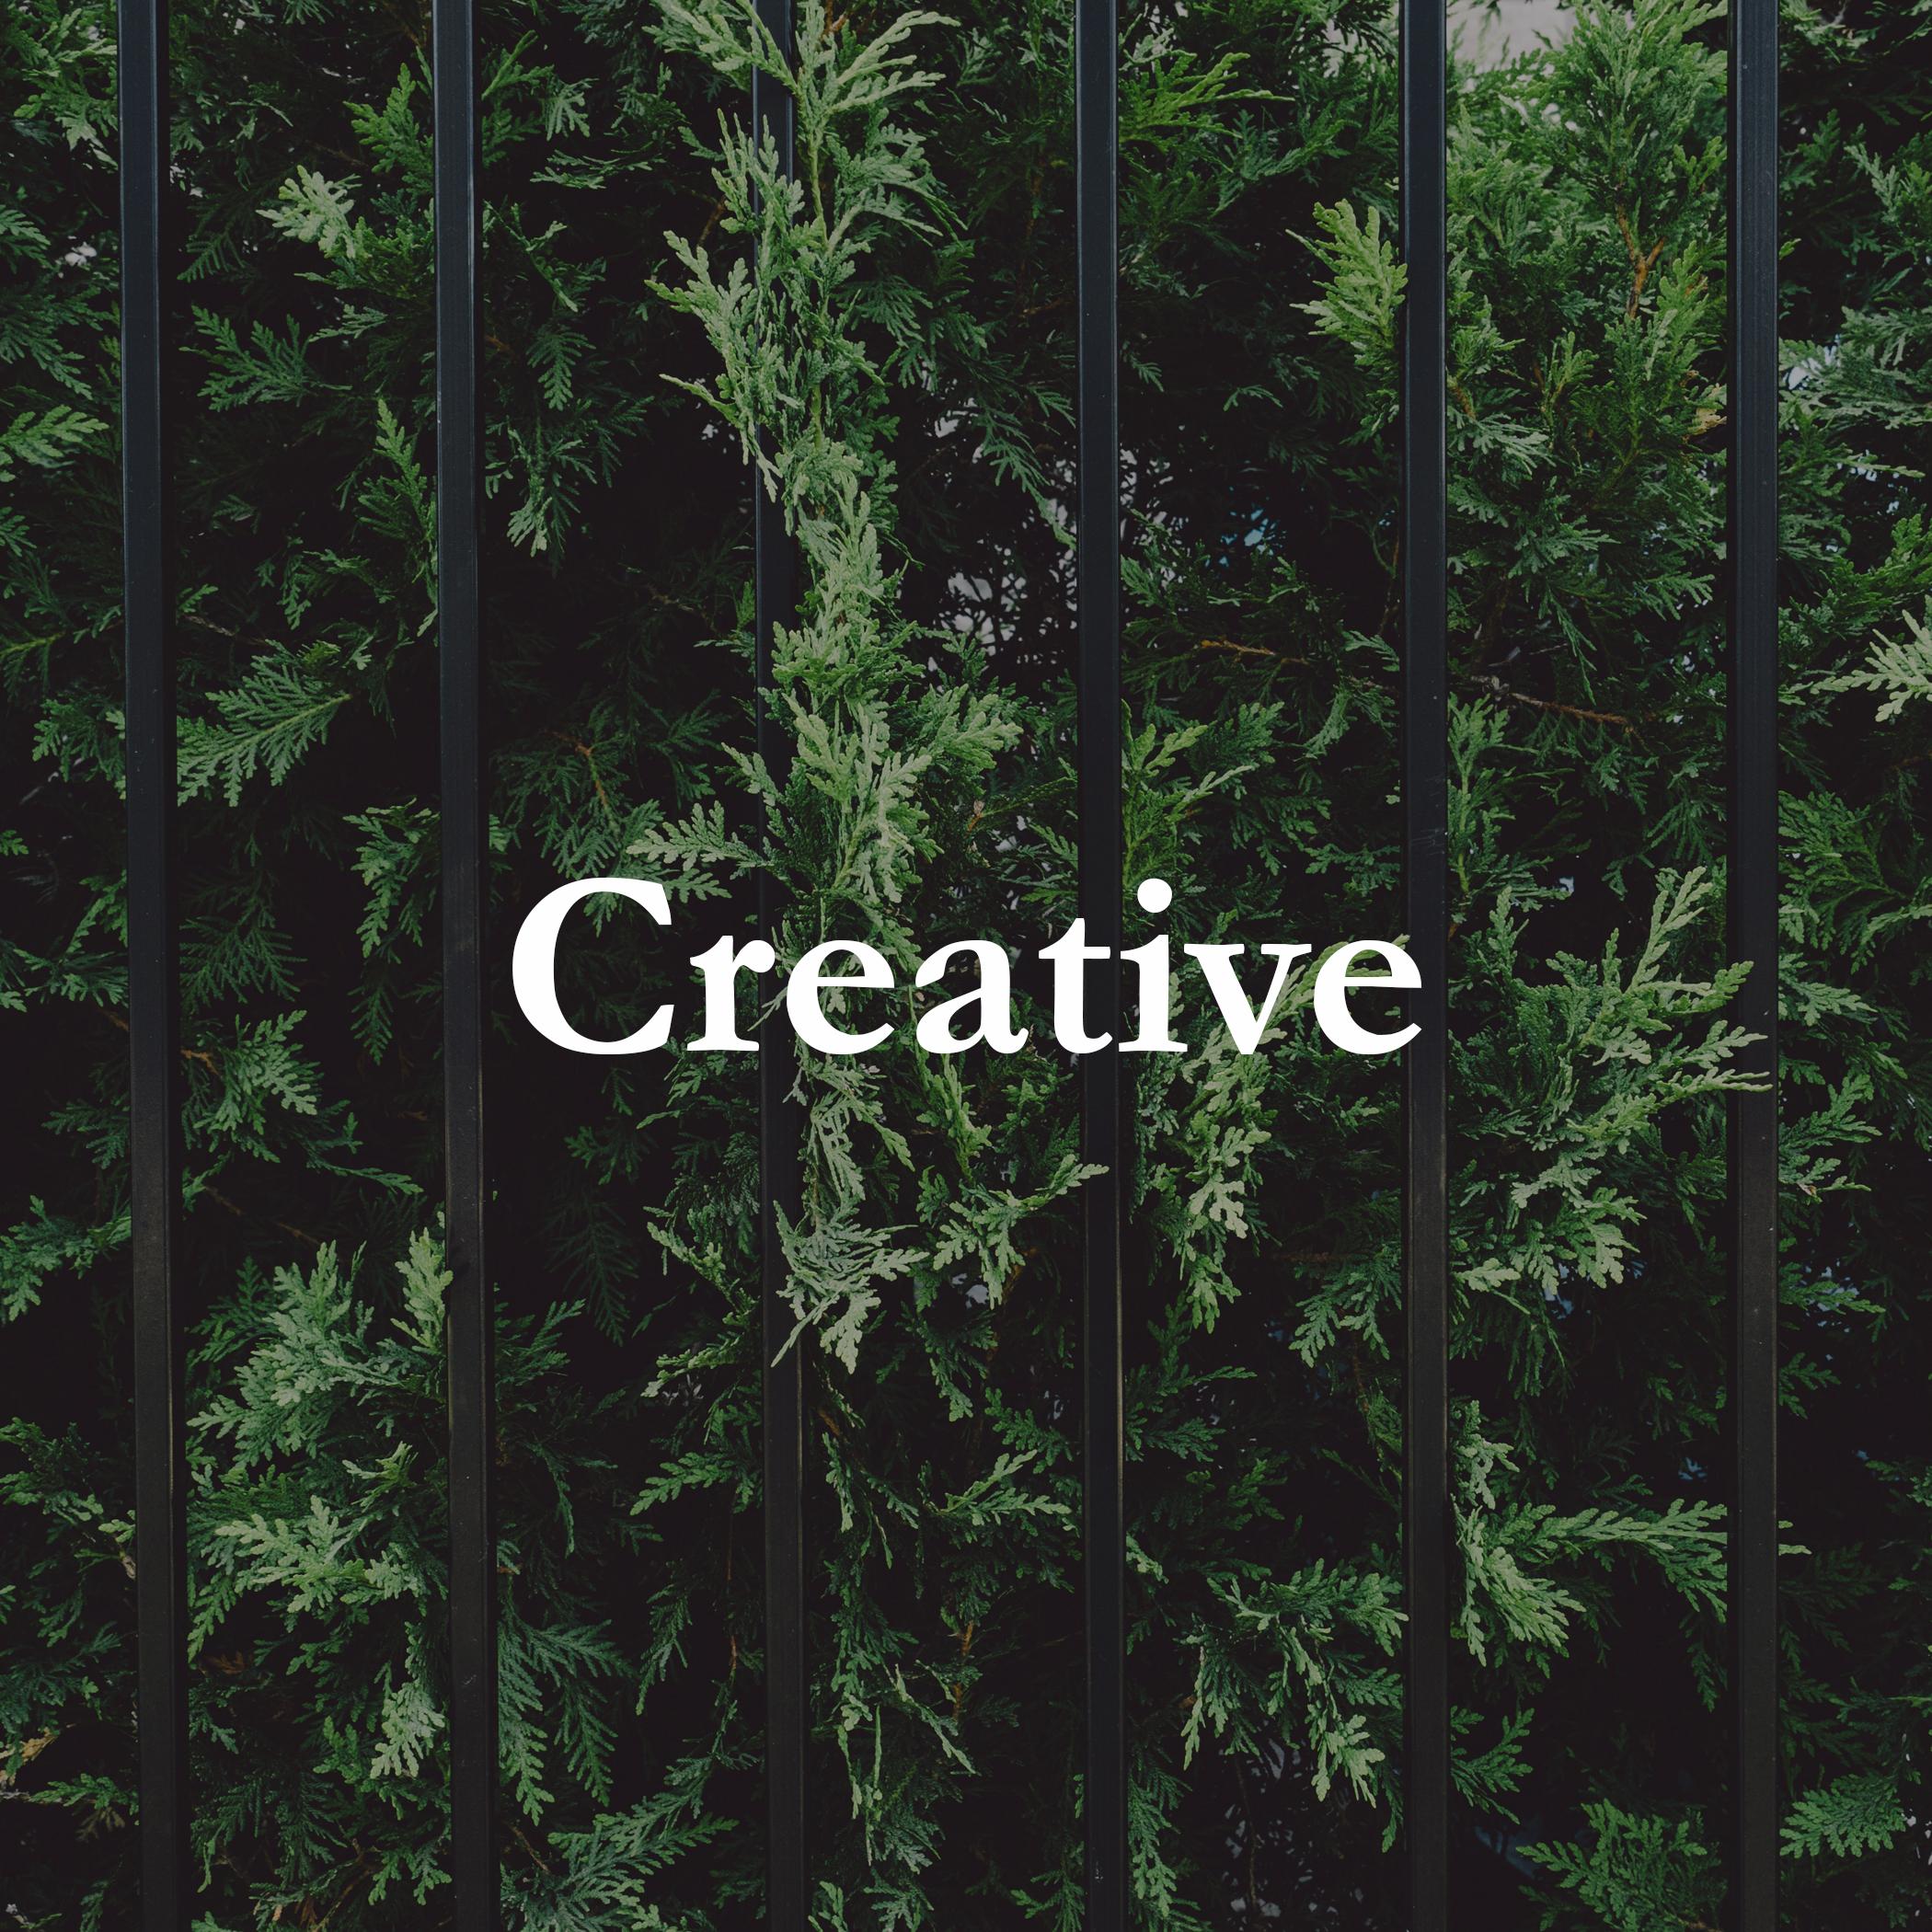 Written Creative.jpg